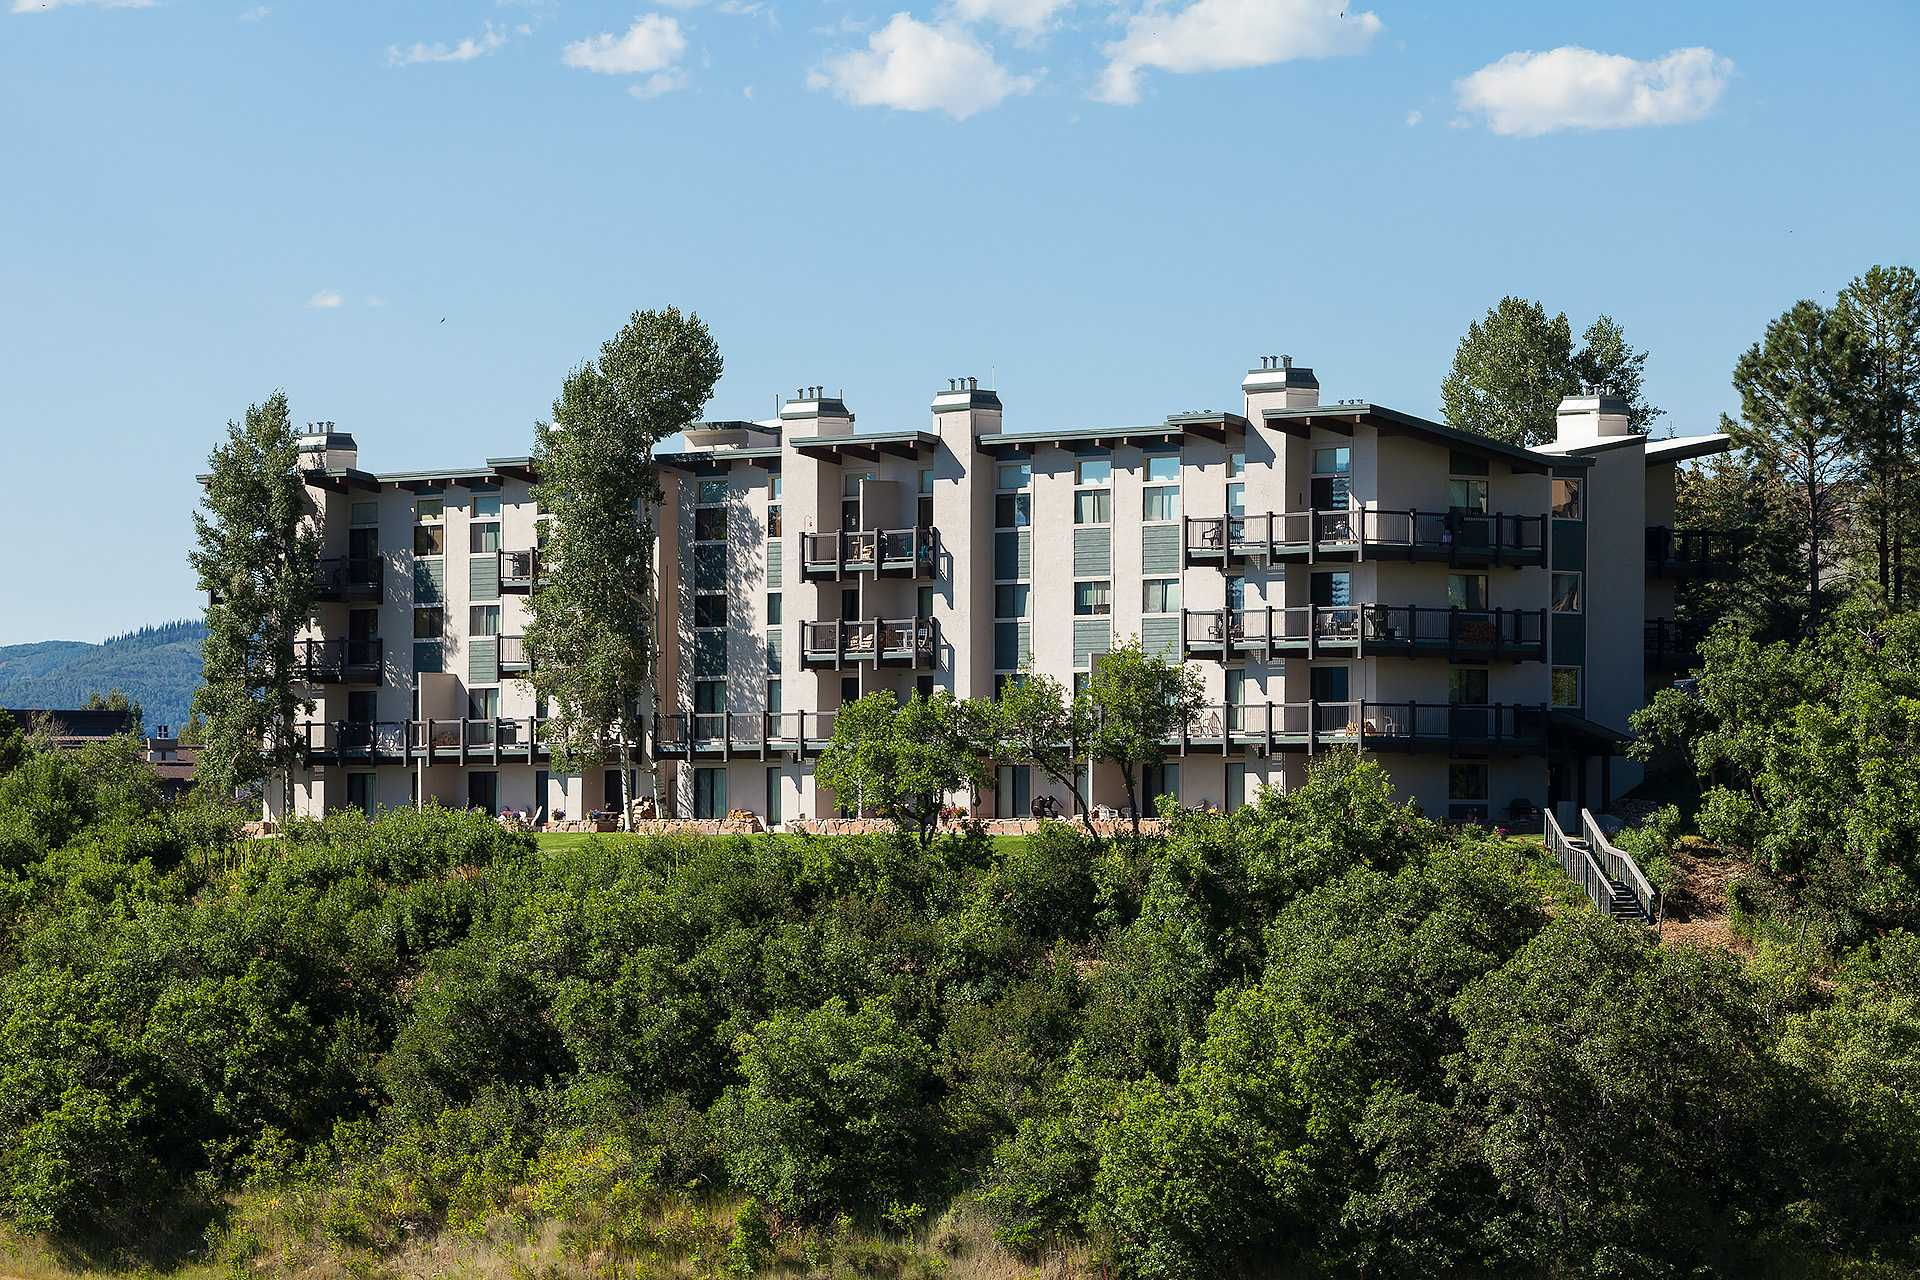 CC318: Storm Meadows Club C Condominiums